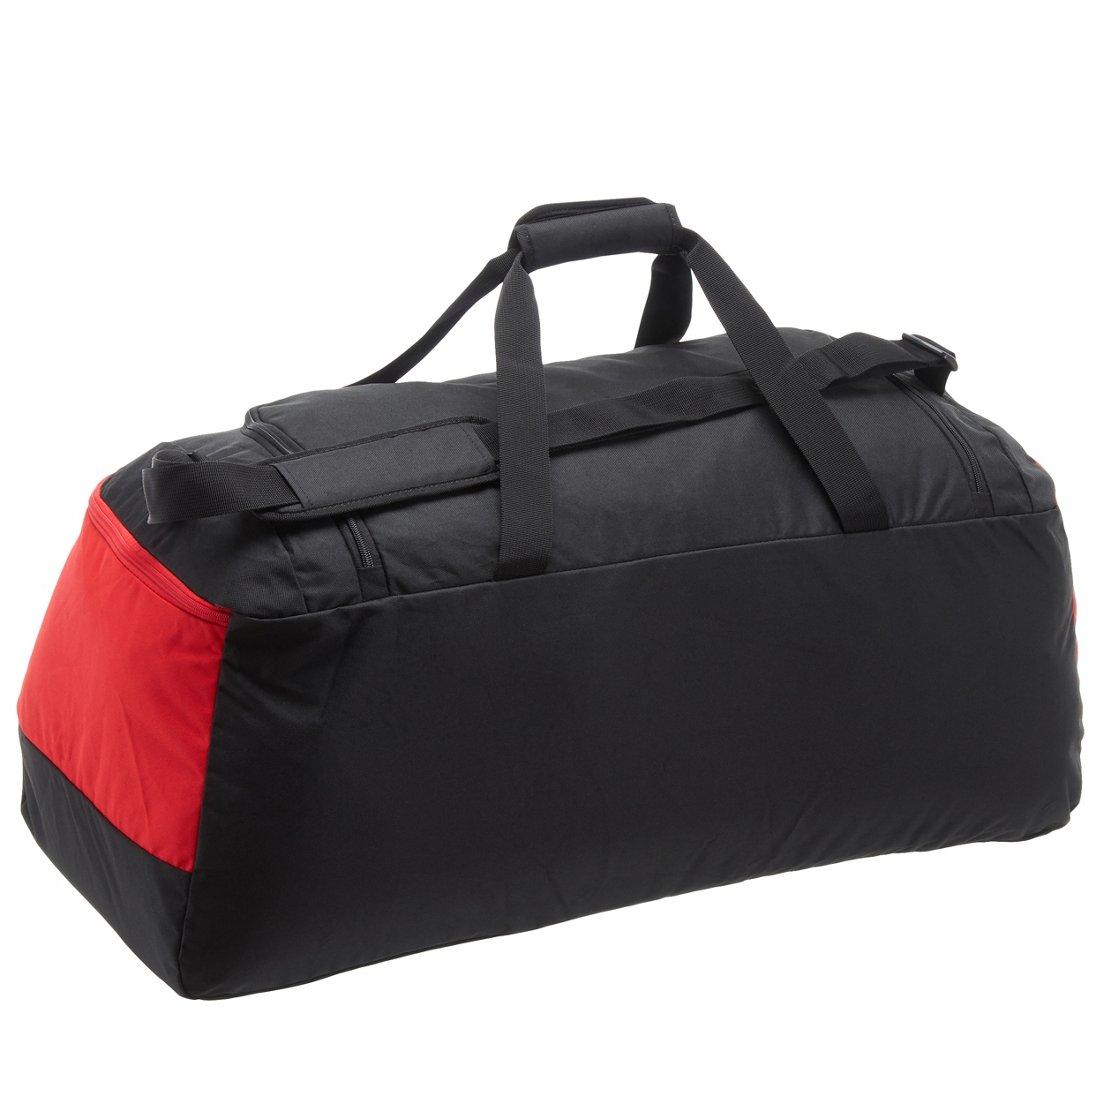 3f904505f5d2e Puma Pro Training II Large Bag Sporttasche 77 cm - koffer-direkt.de